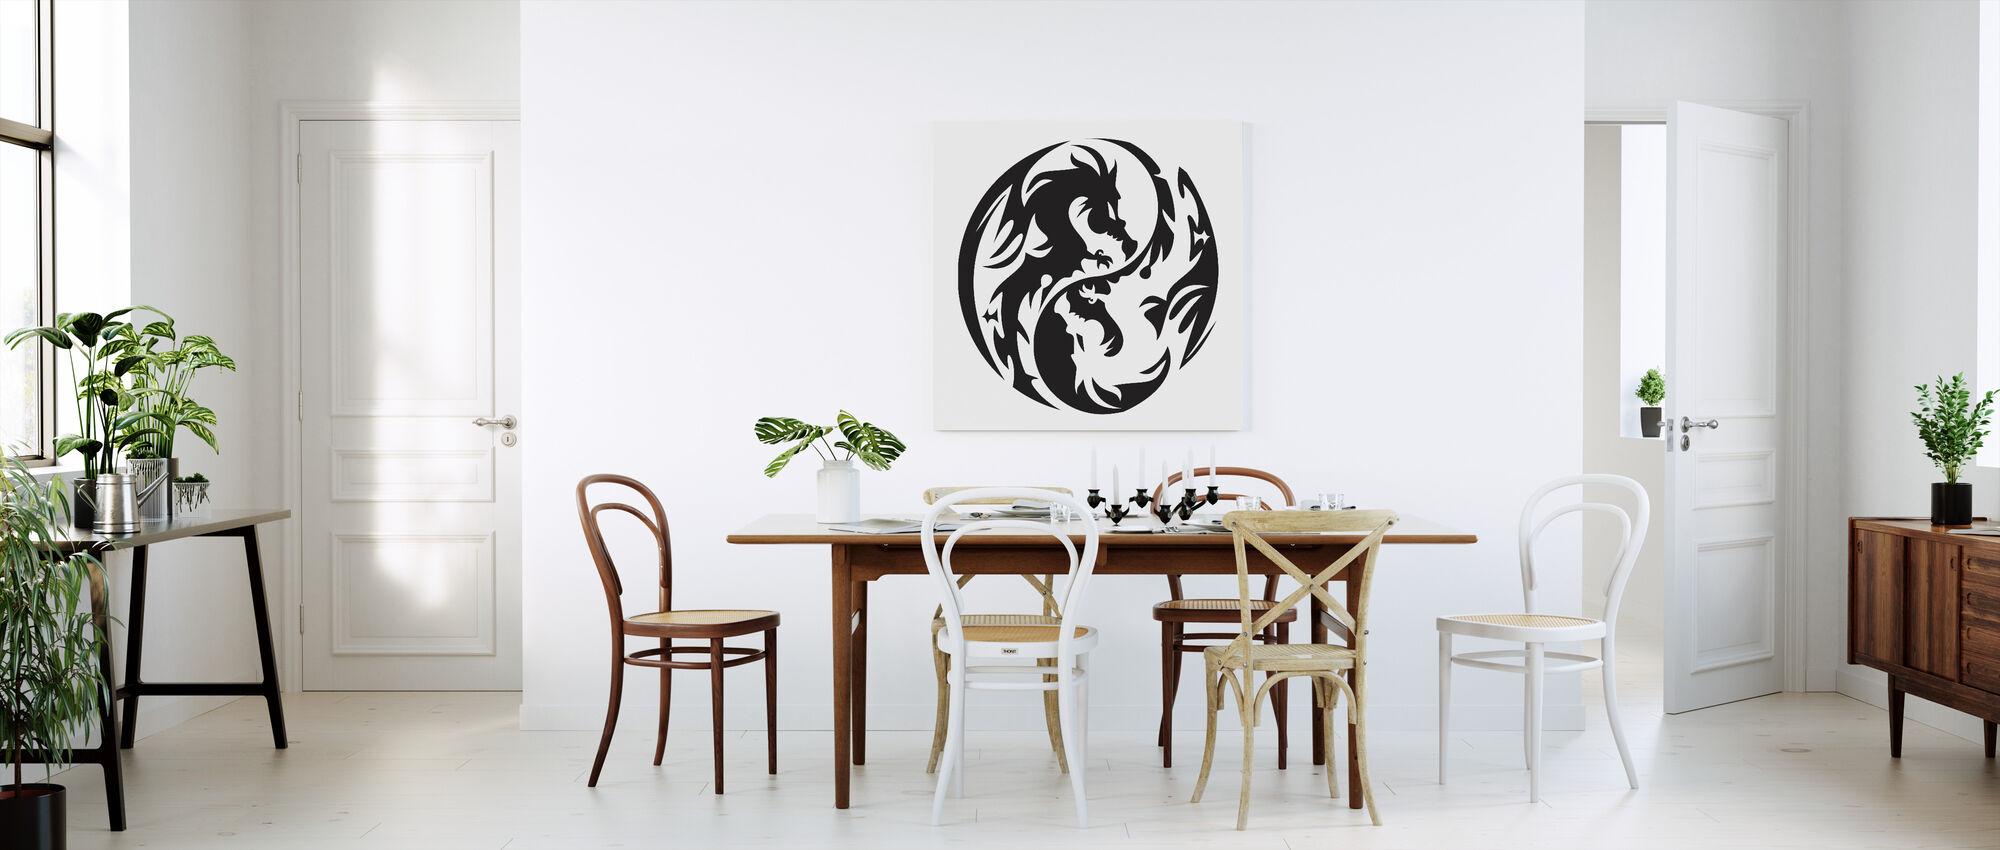 Circle Dragons - Canvas print - Kitchen